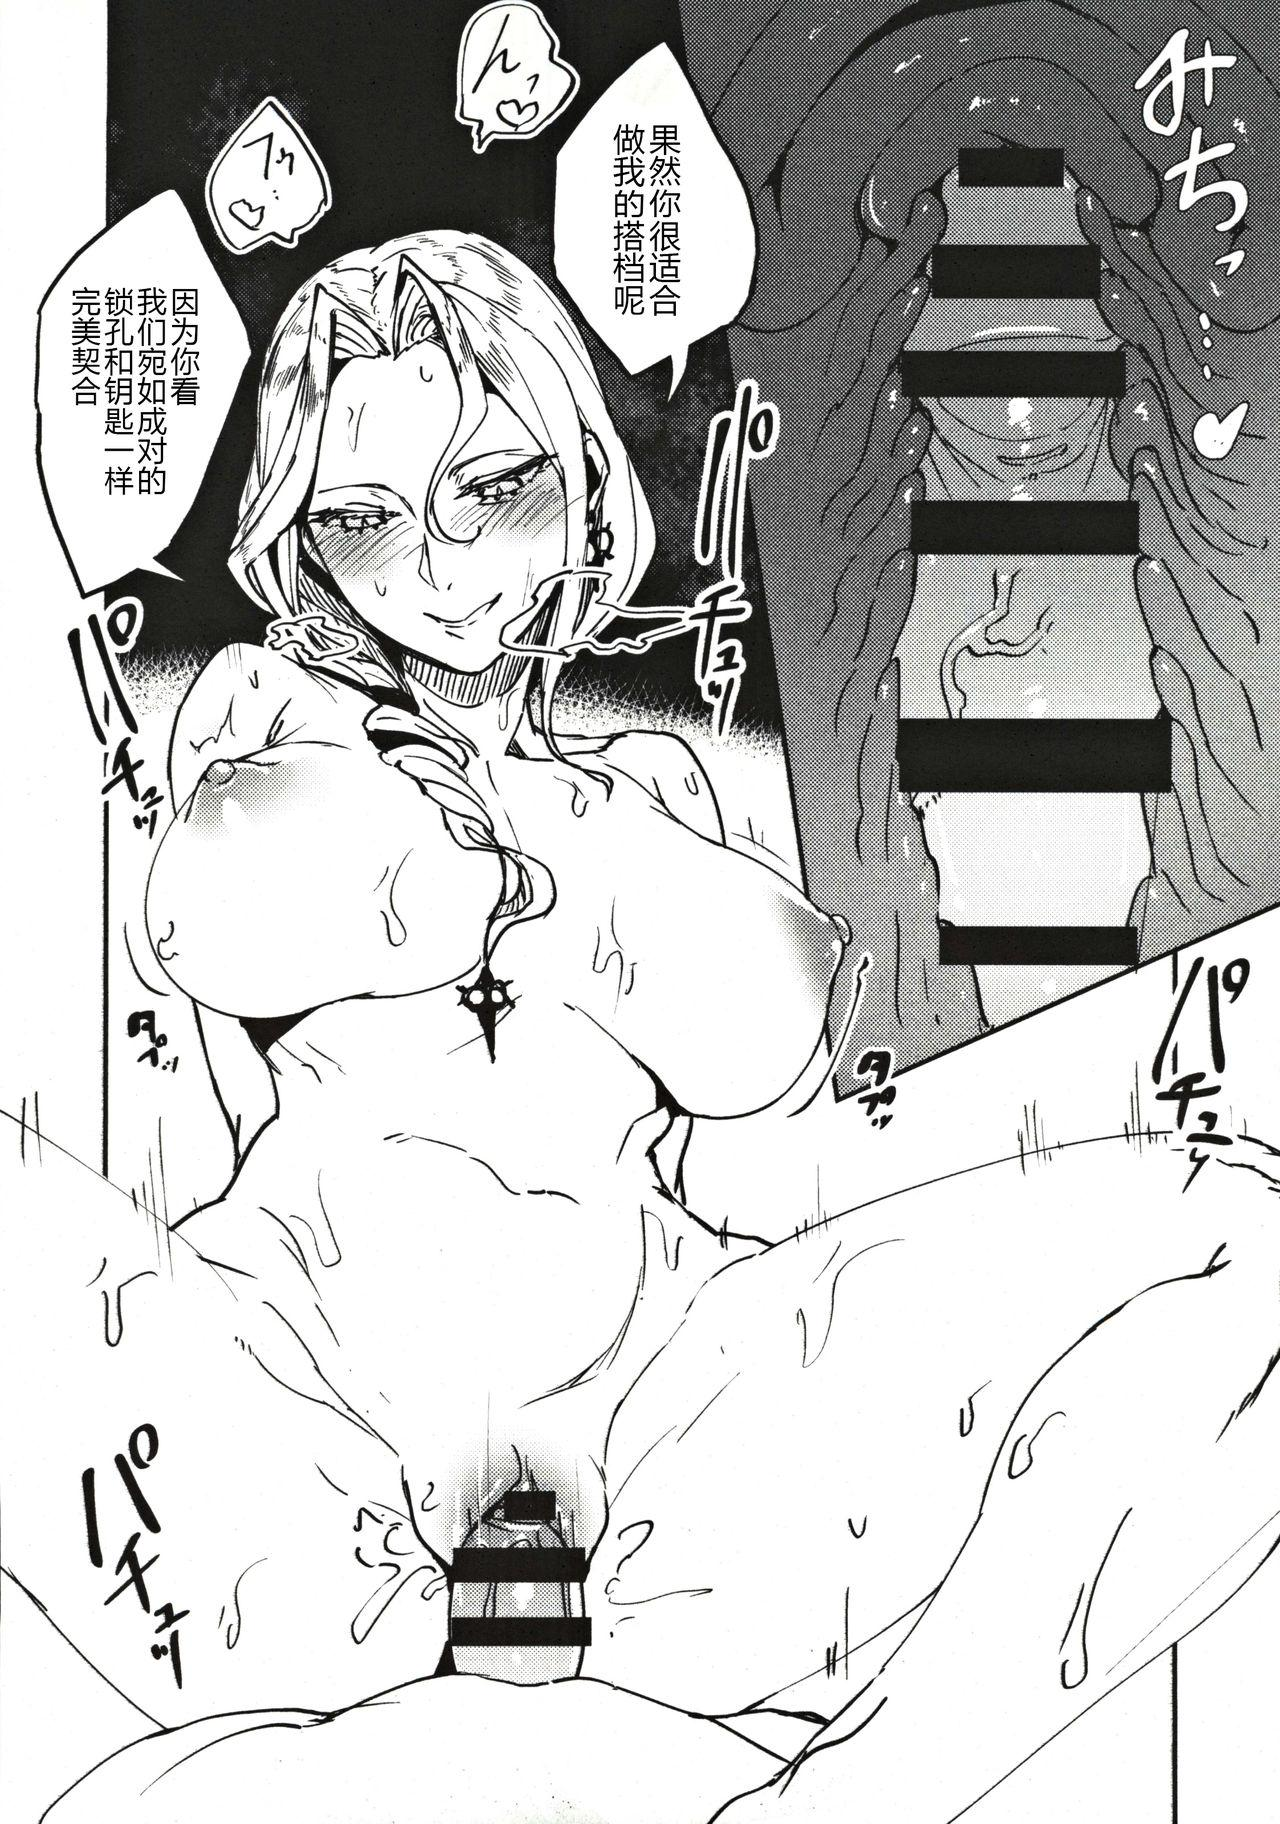 Carmilla-san no Ecchi na no ga Kakitakatta Hon 7